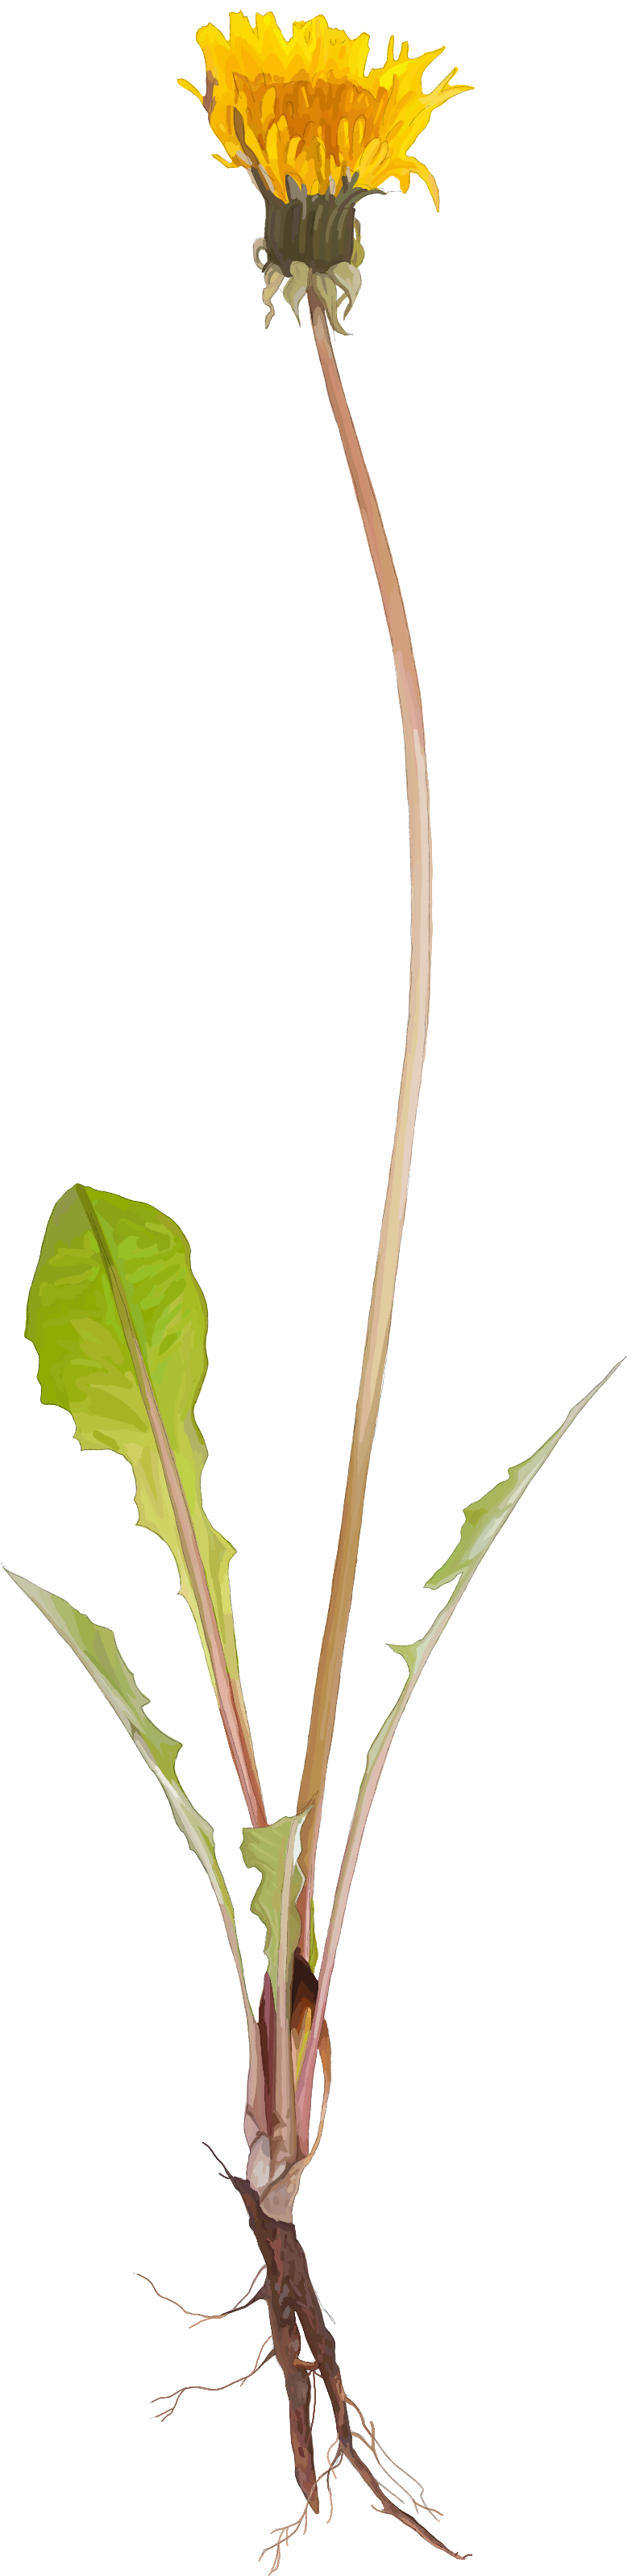 Dandelion. Taraxacum officinale